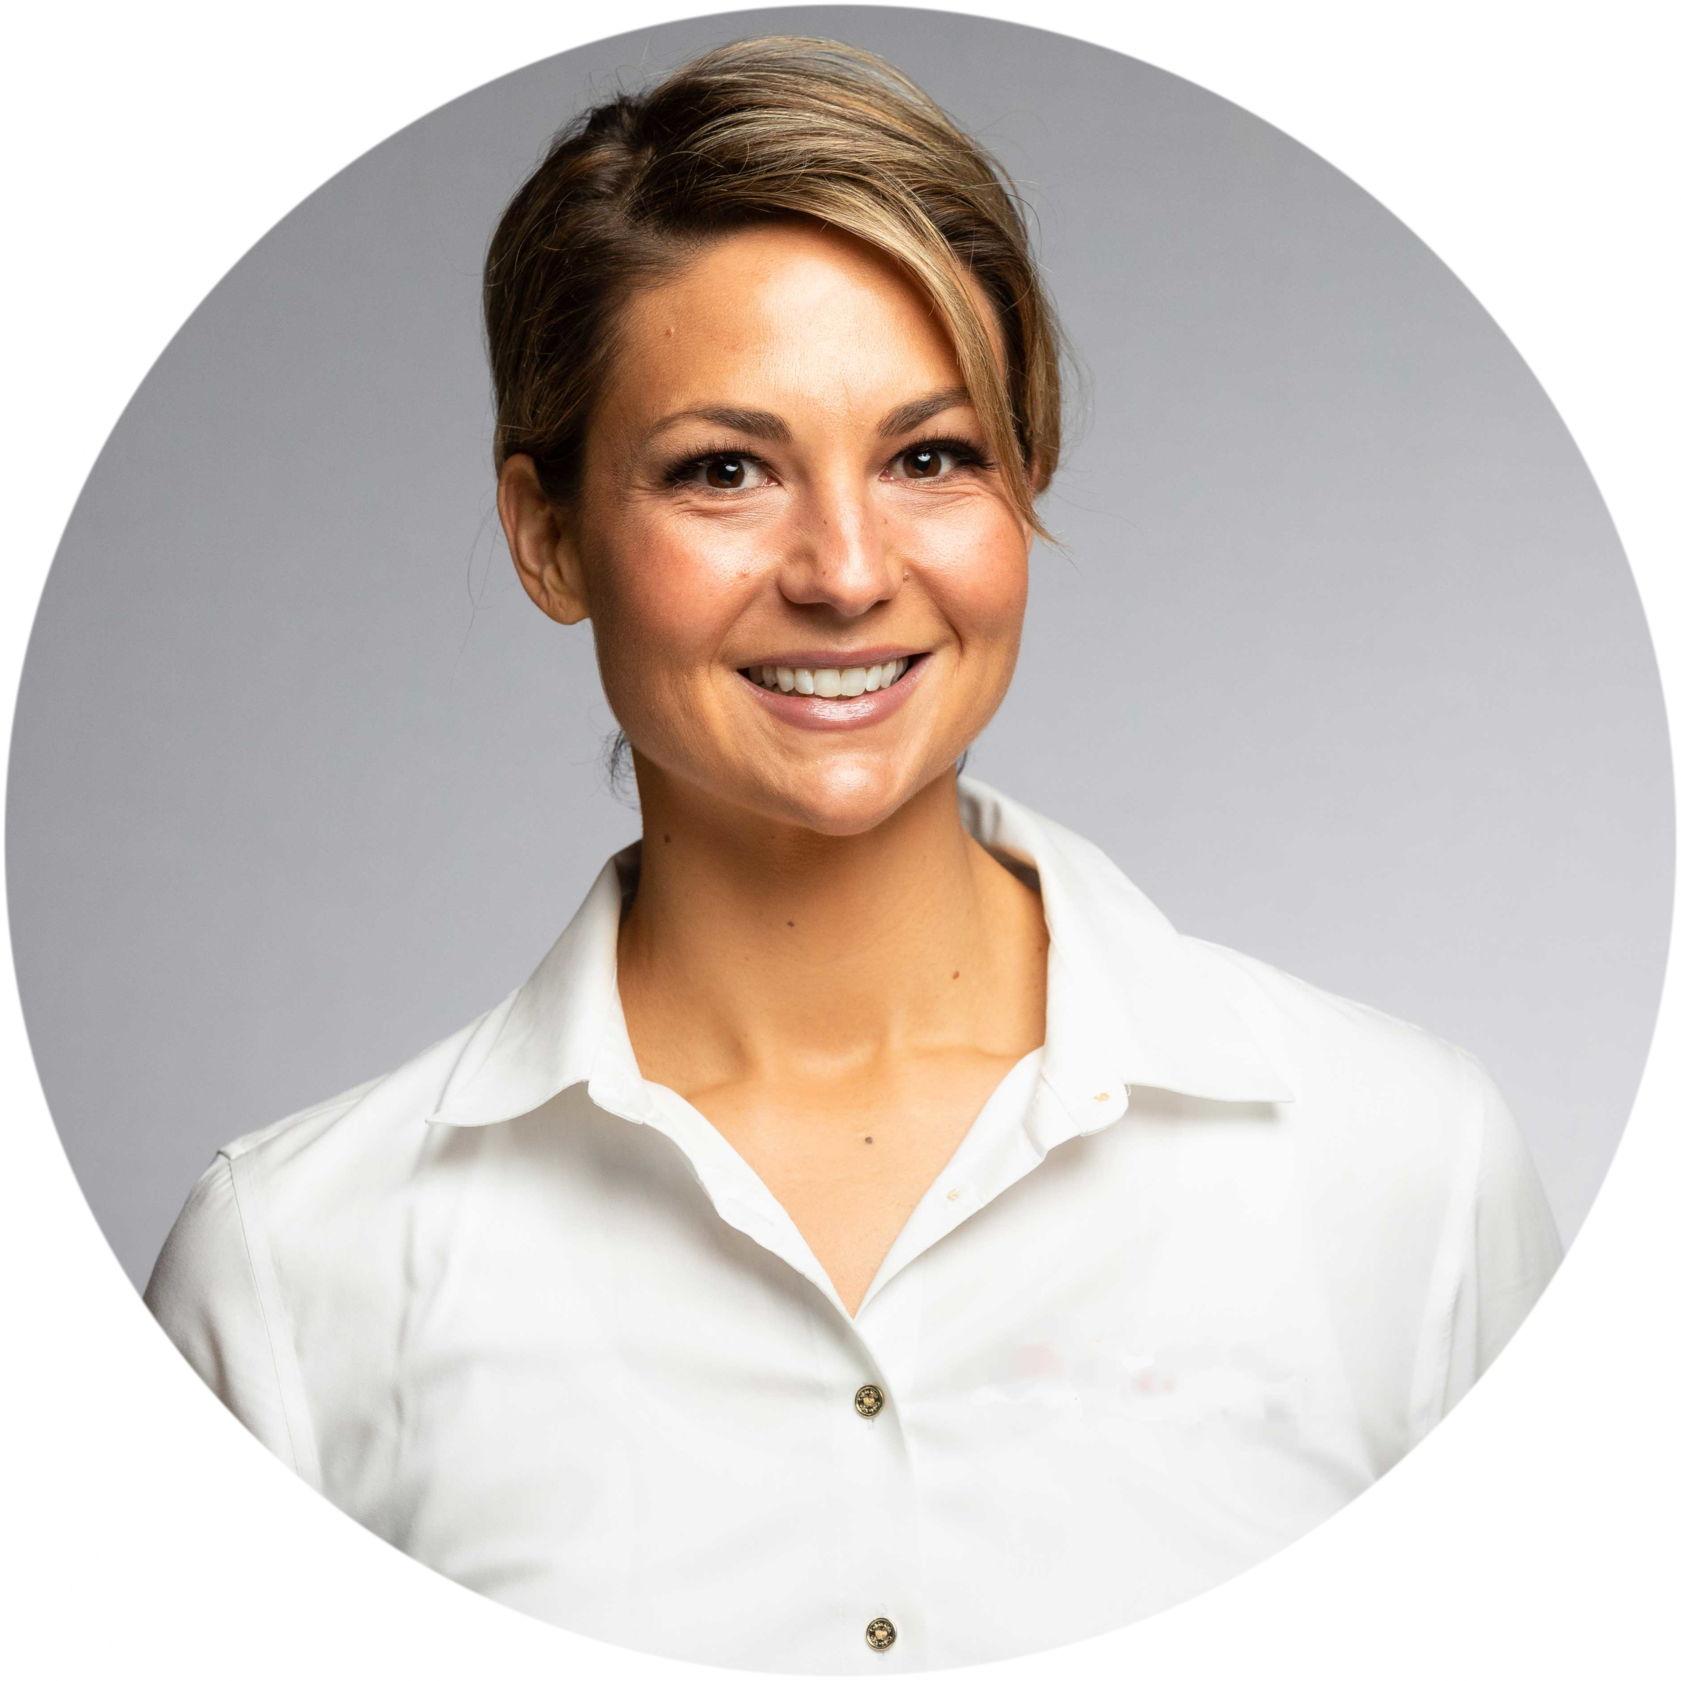 Monica Chapman